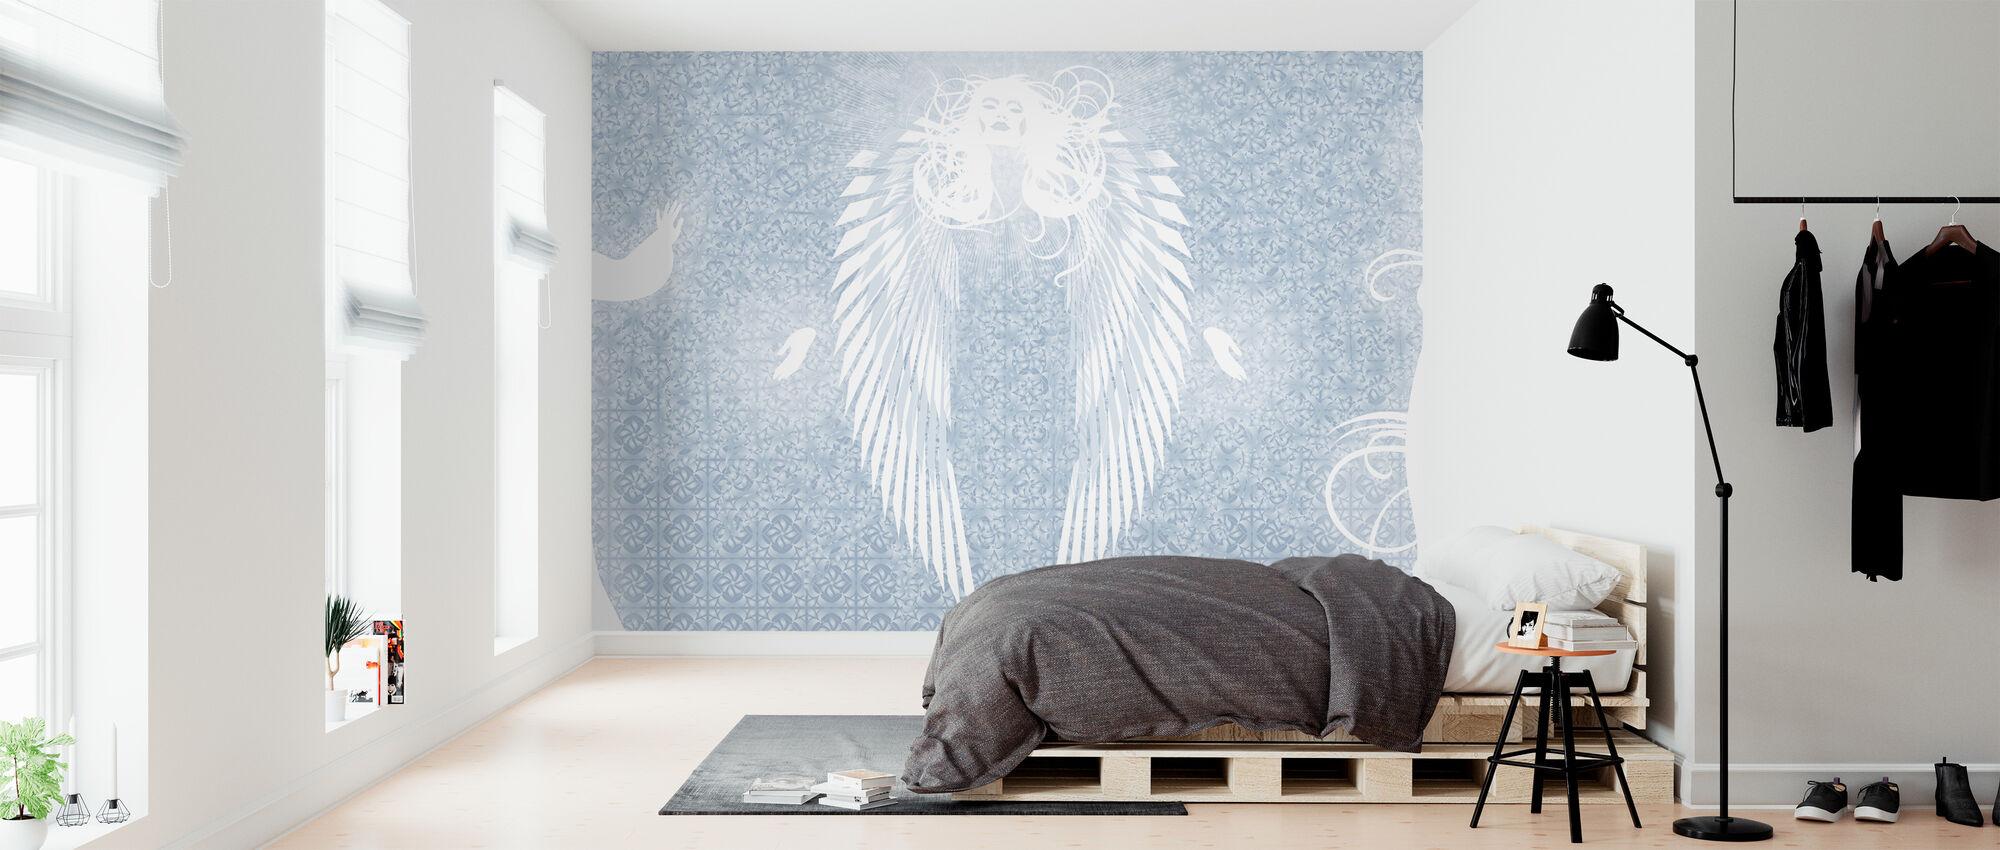 Birgit Amadori - Metatron - Tapete - Schlafzimmer